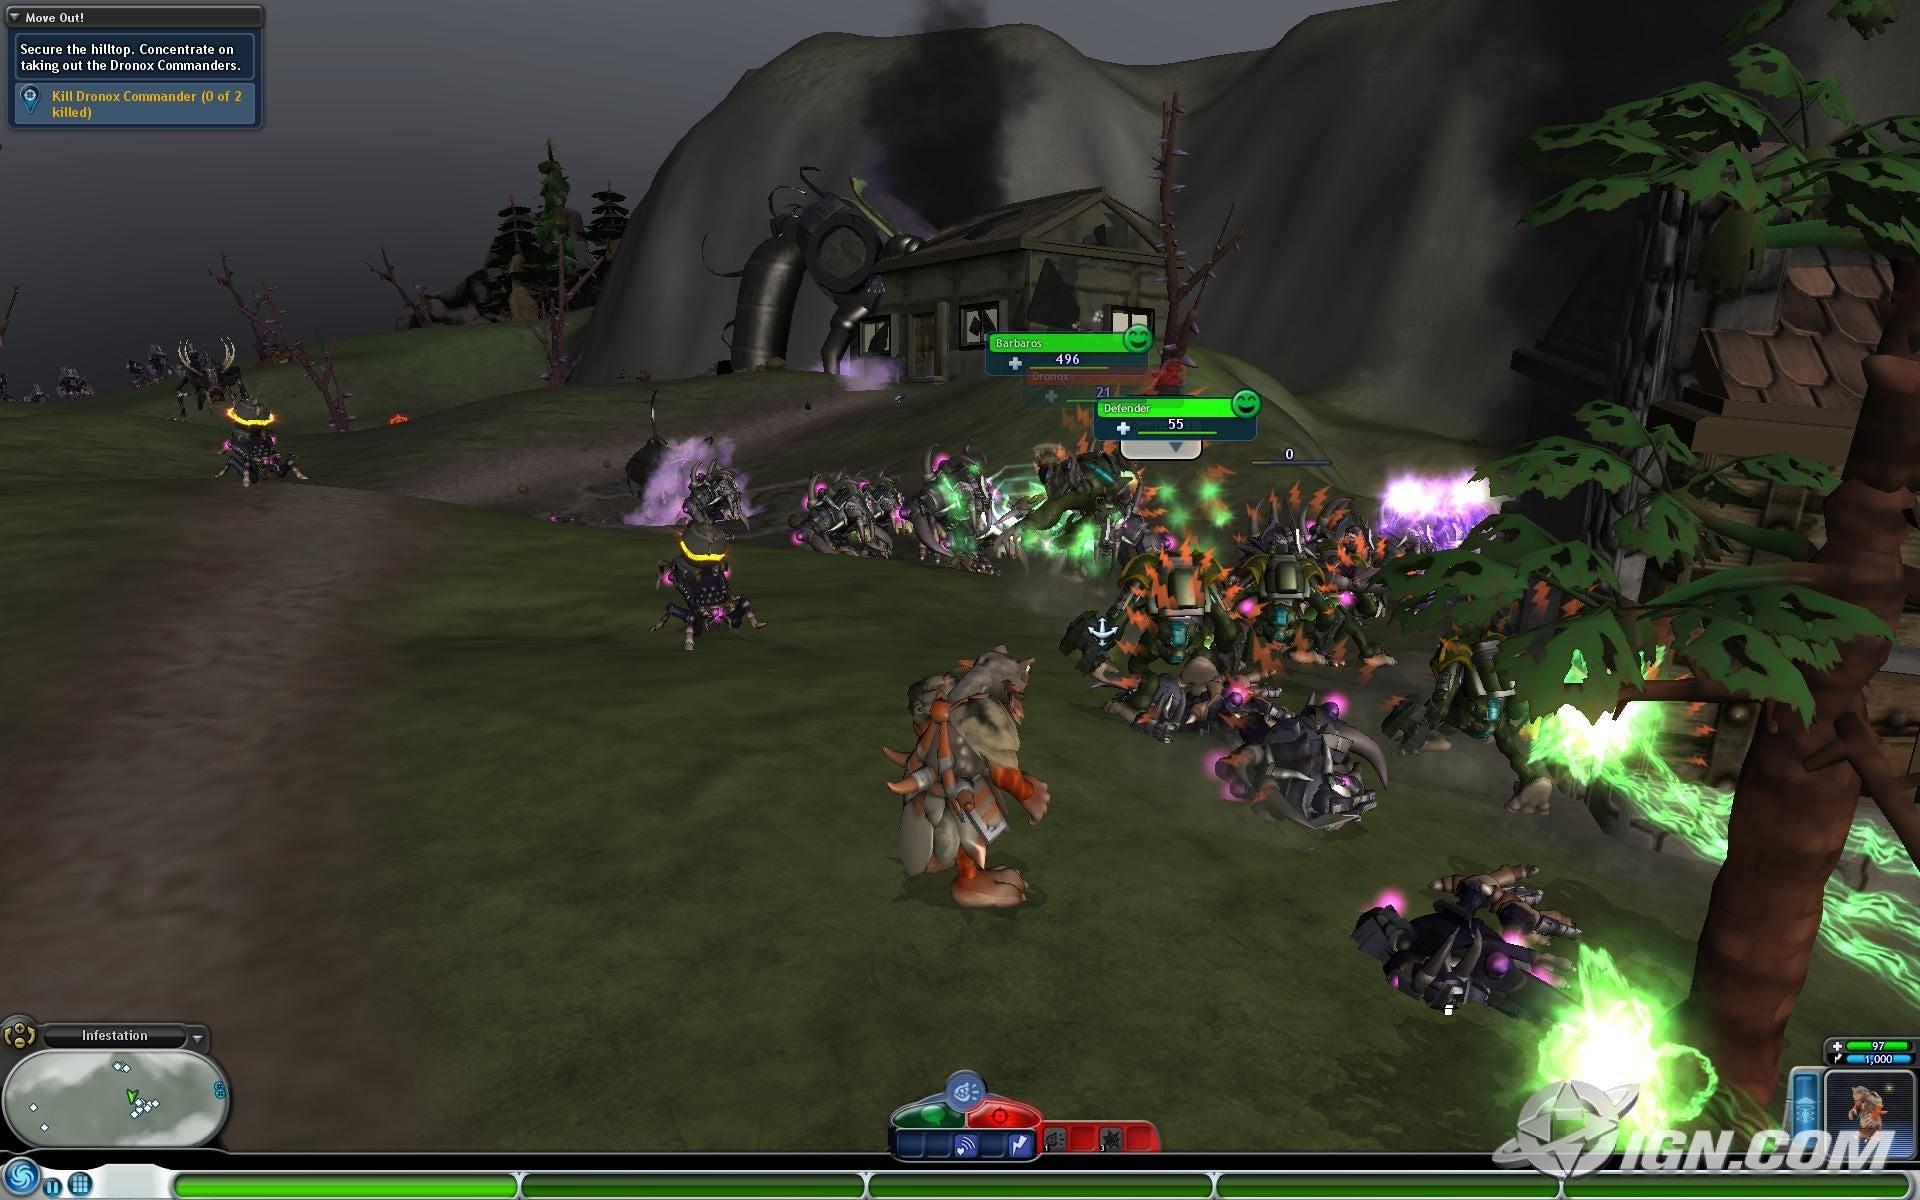 Spore: Galactic Adventures Screenshot